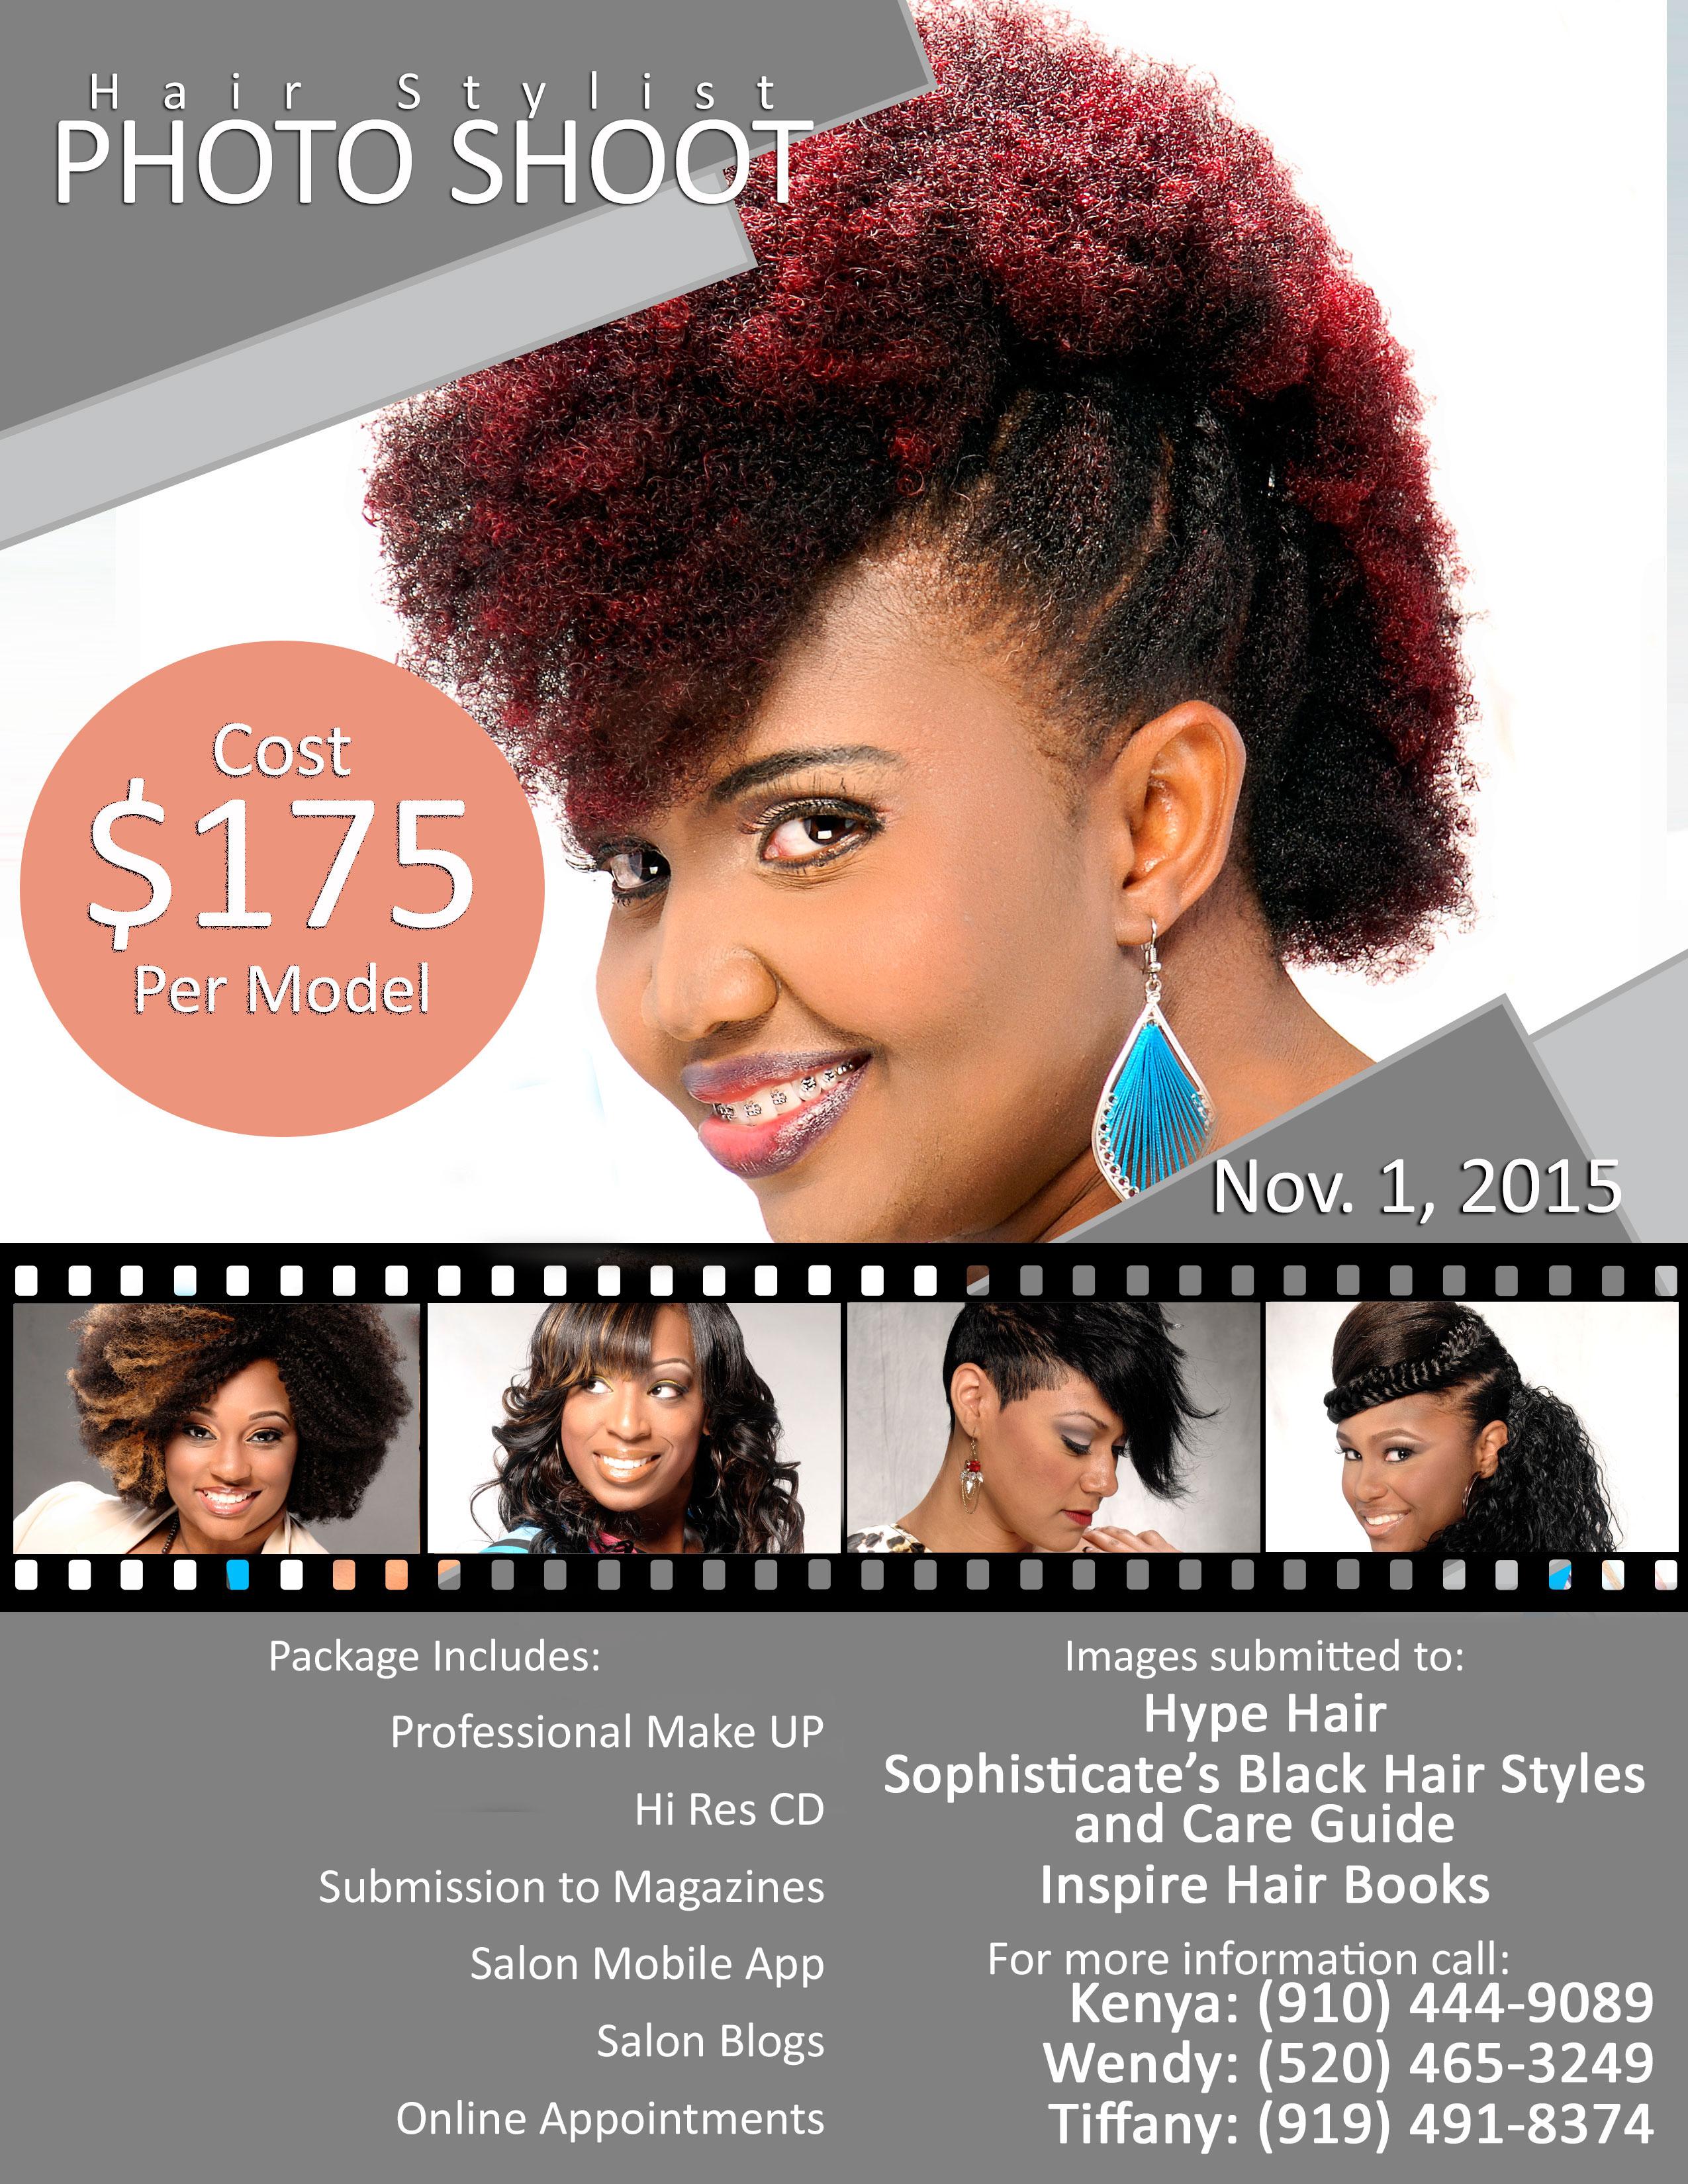 Durham NC Hairstylist Photo Shoot